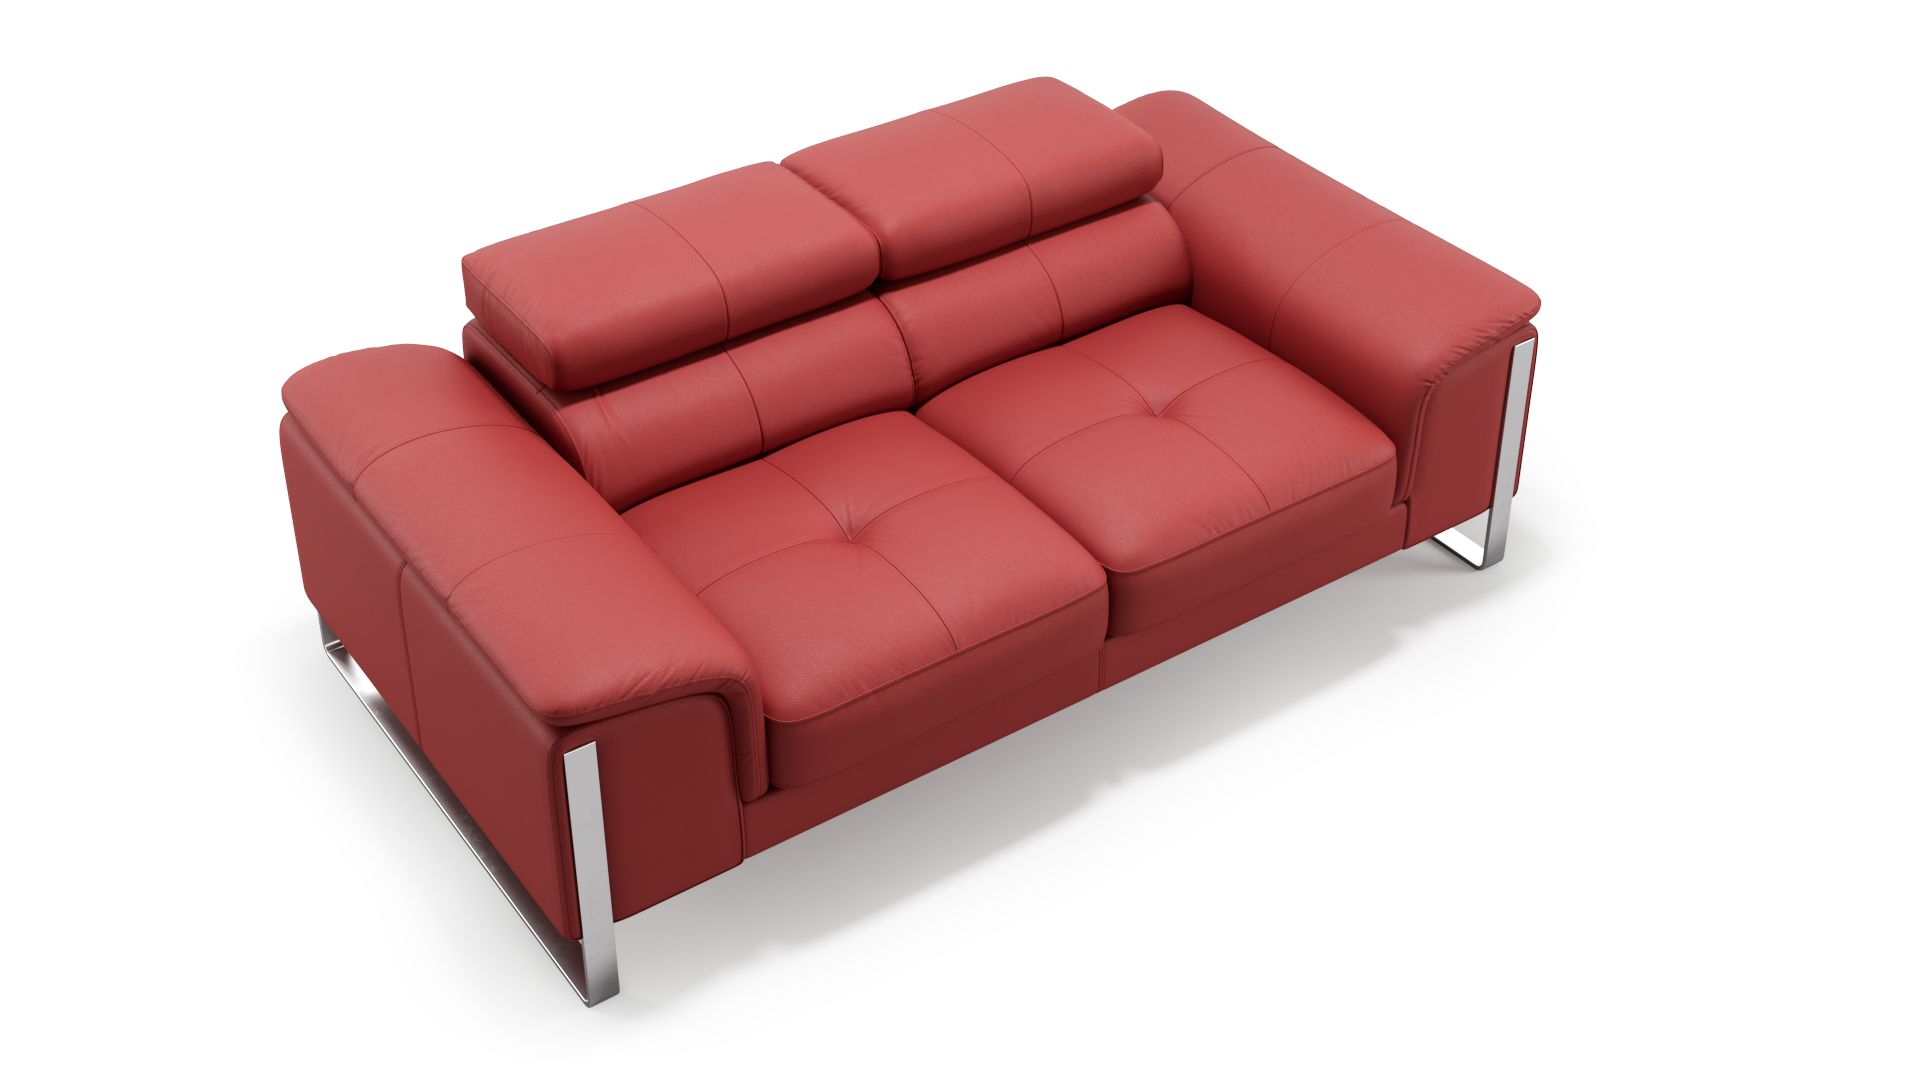 Leder 2-Sitzer Sofa PIZZOLI